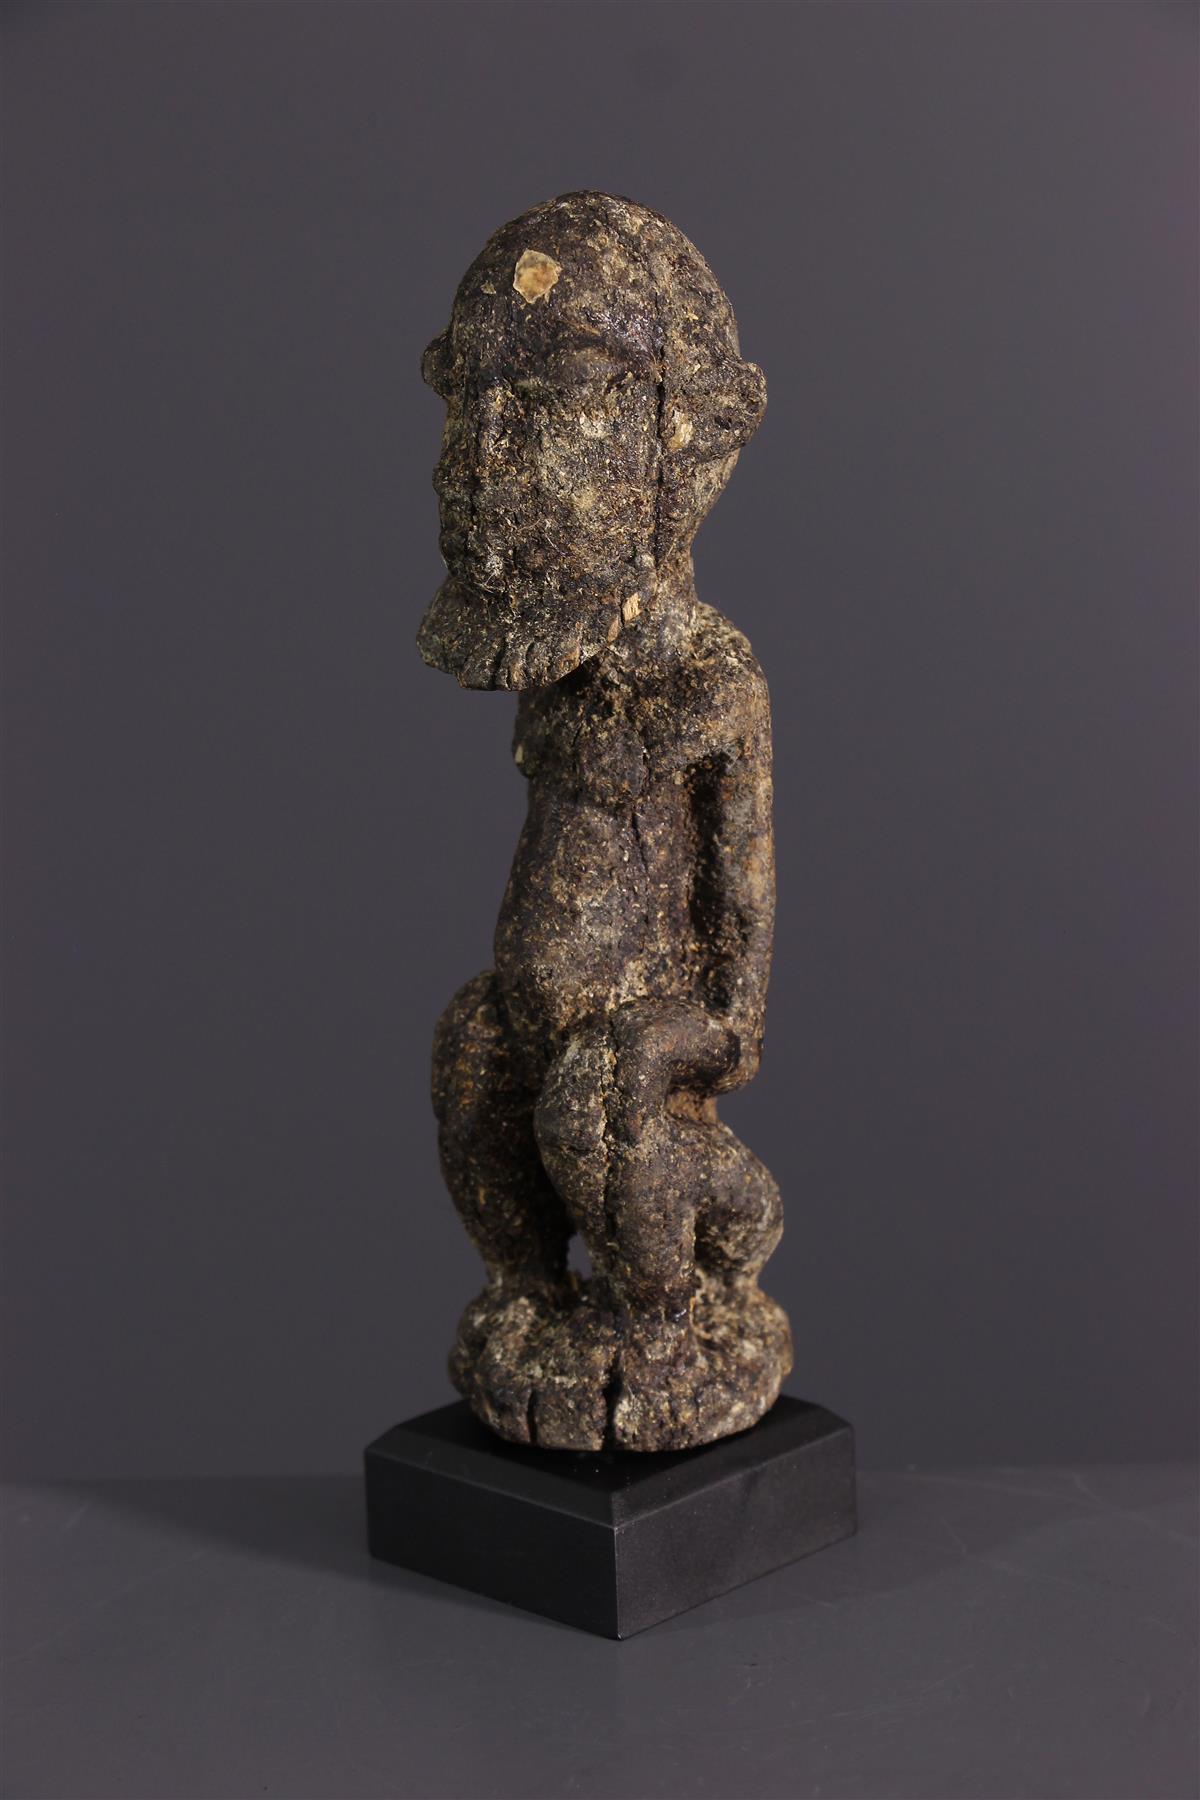 Dogon figurines - Tribal art